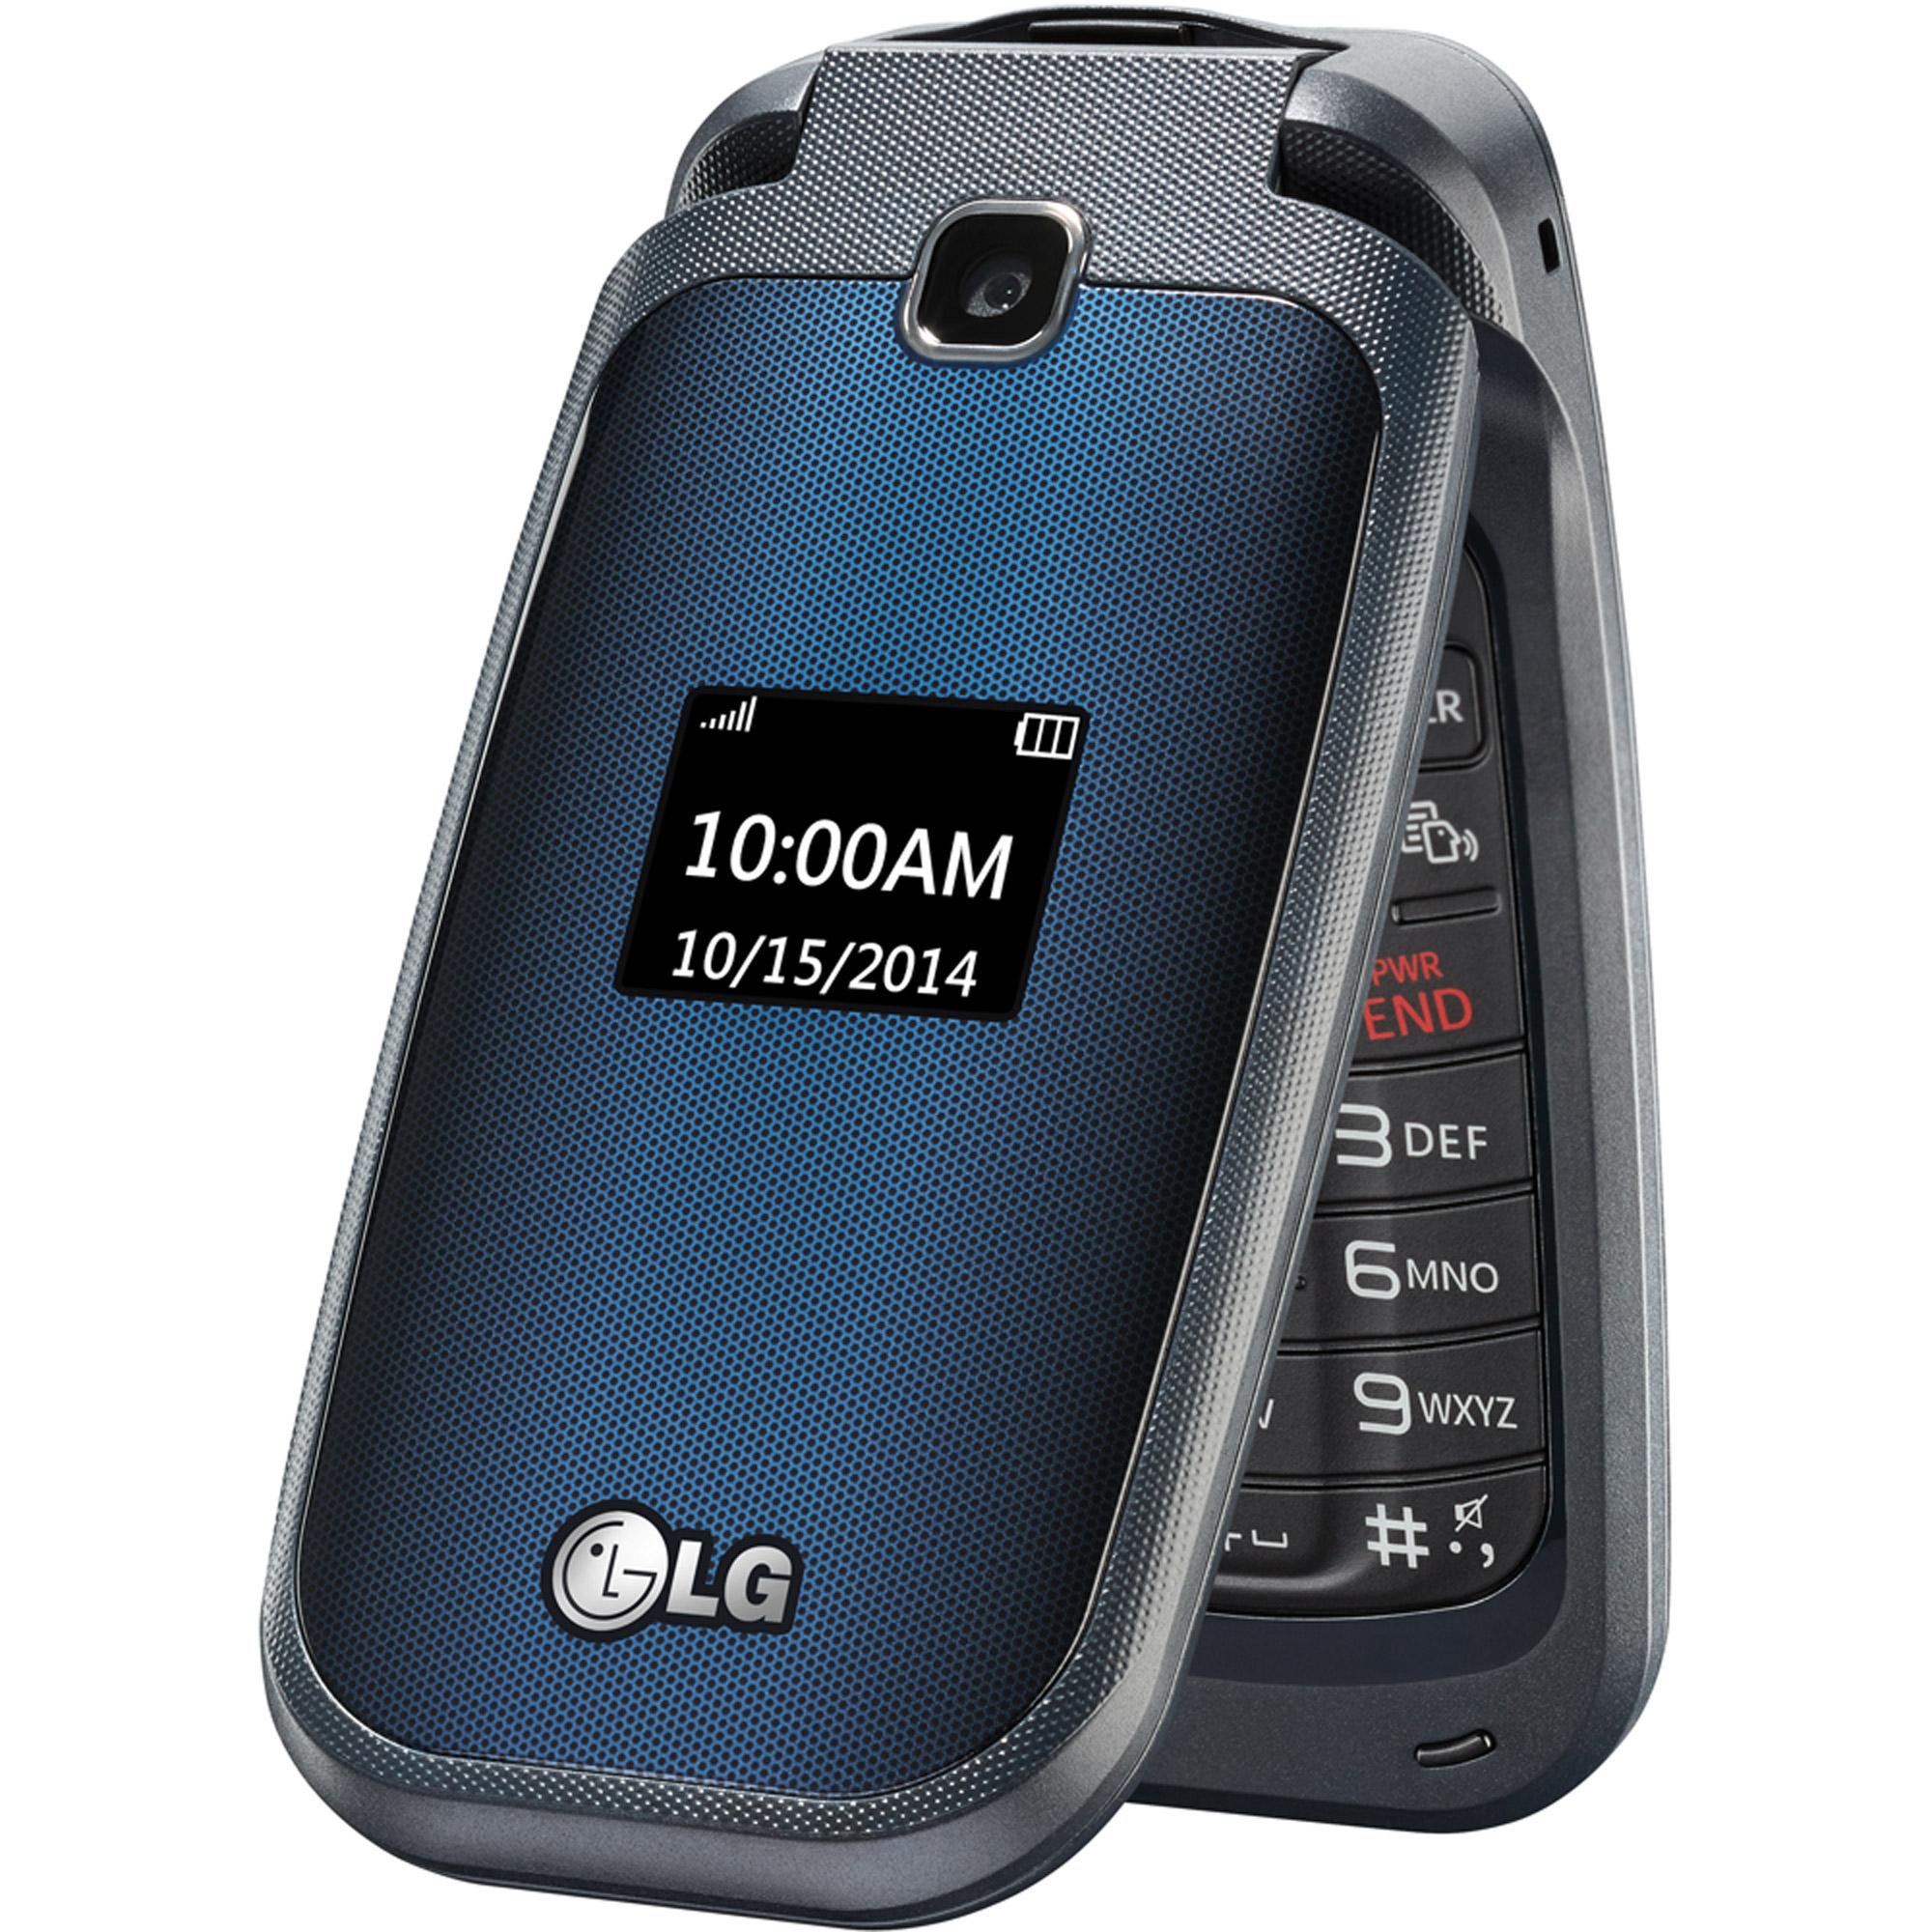 Walmart Family Mobile LG 450 Cell Phone